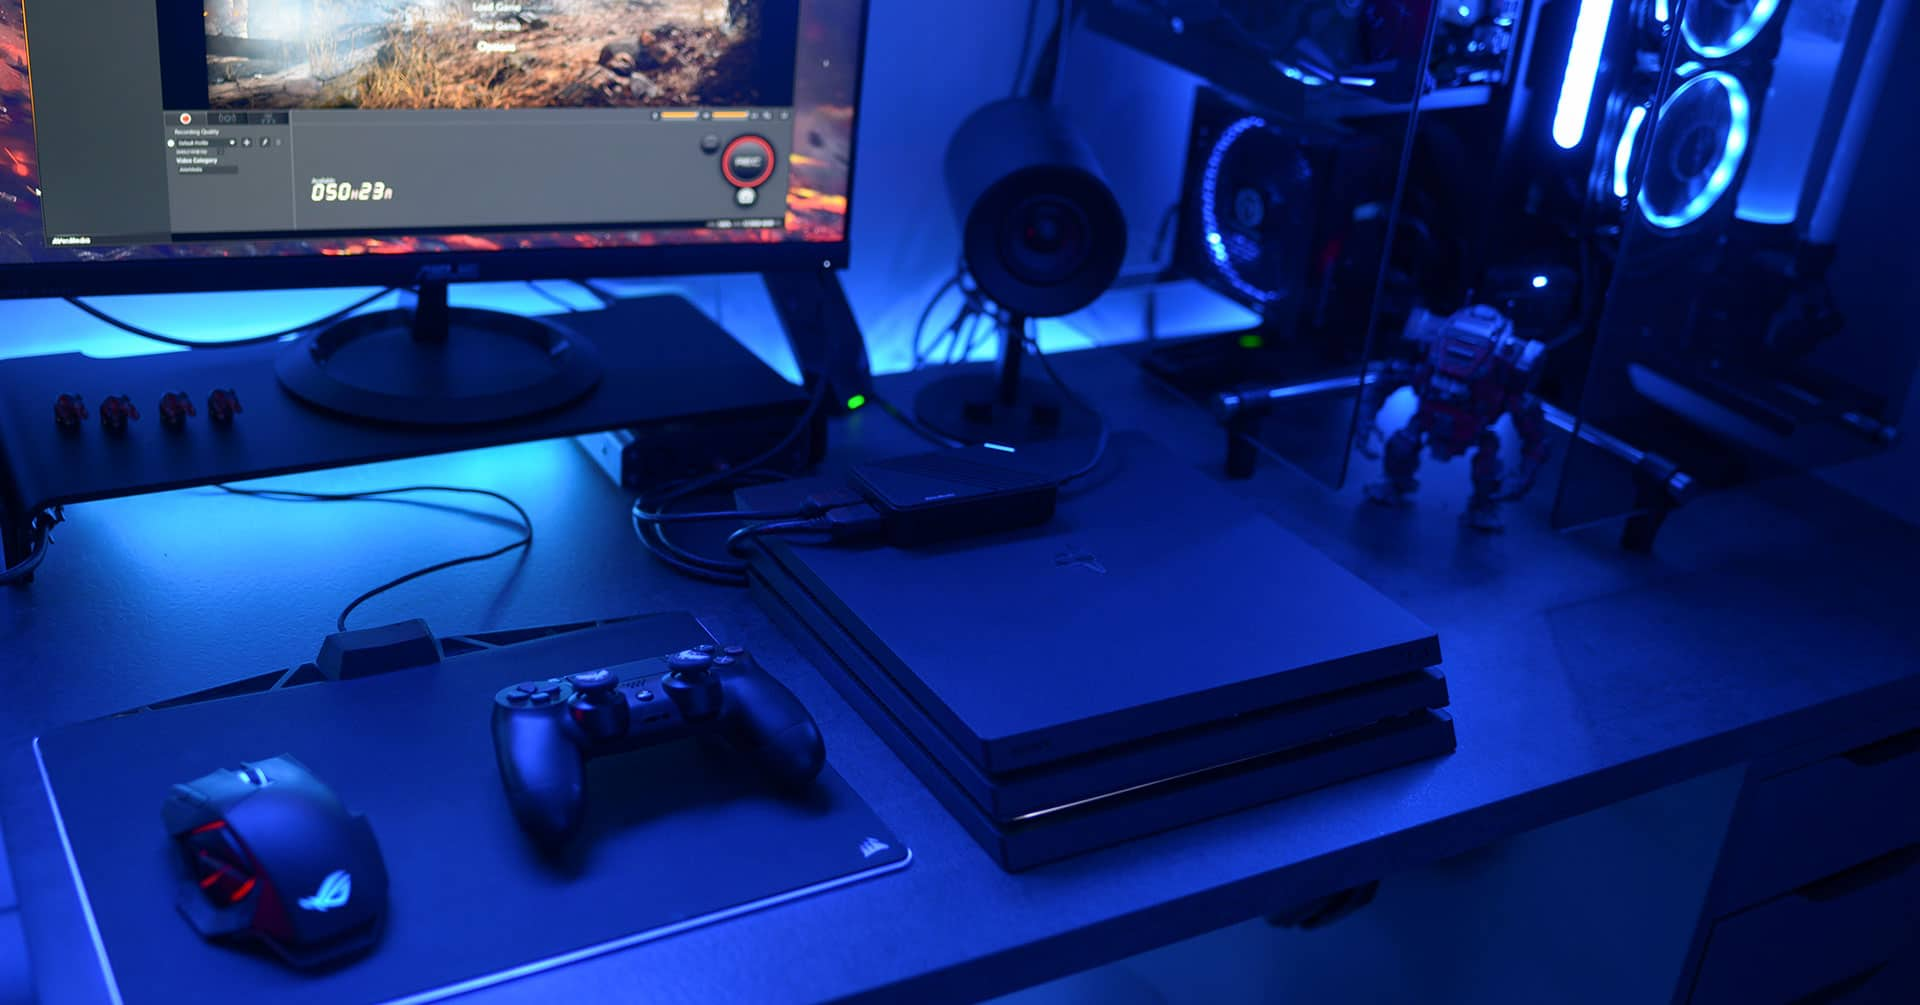 AVerMedia Live Gamer Ultra vs Elgato HD60 S Game Captures